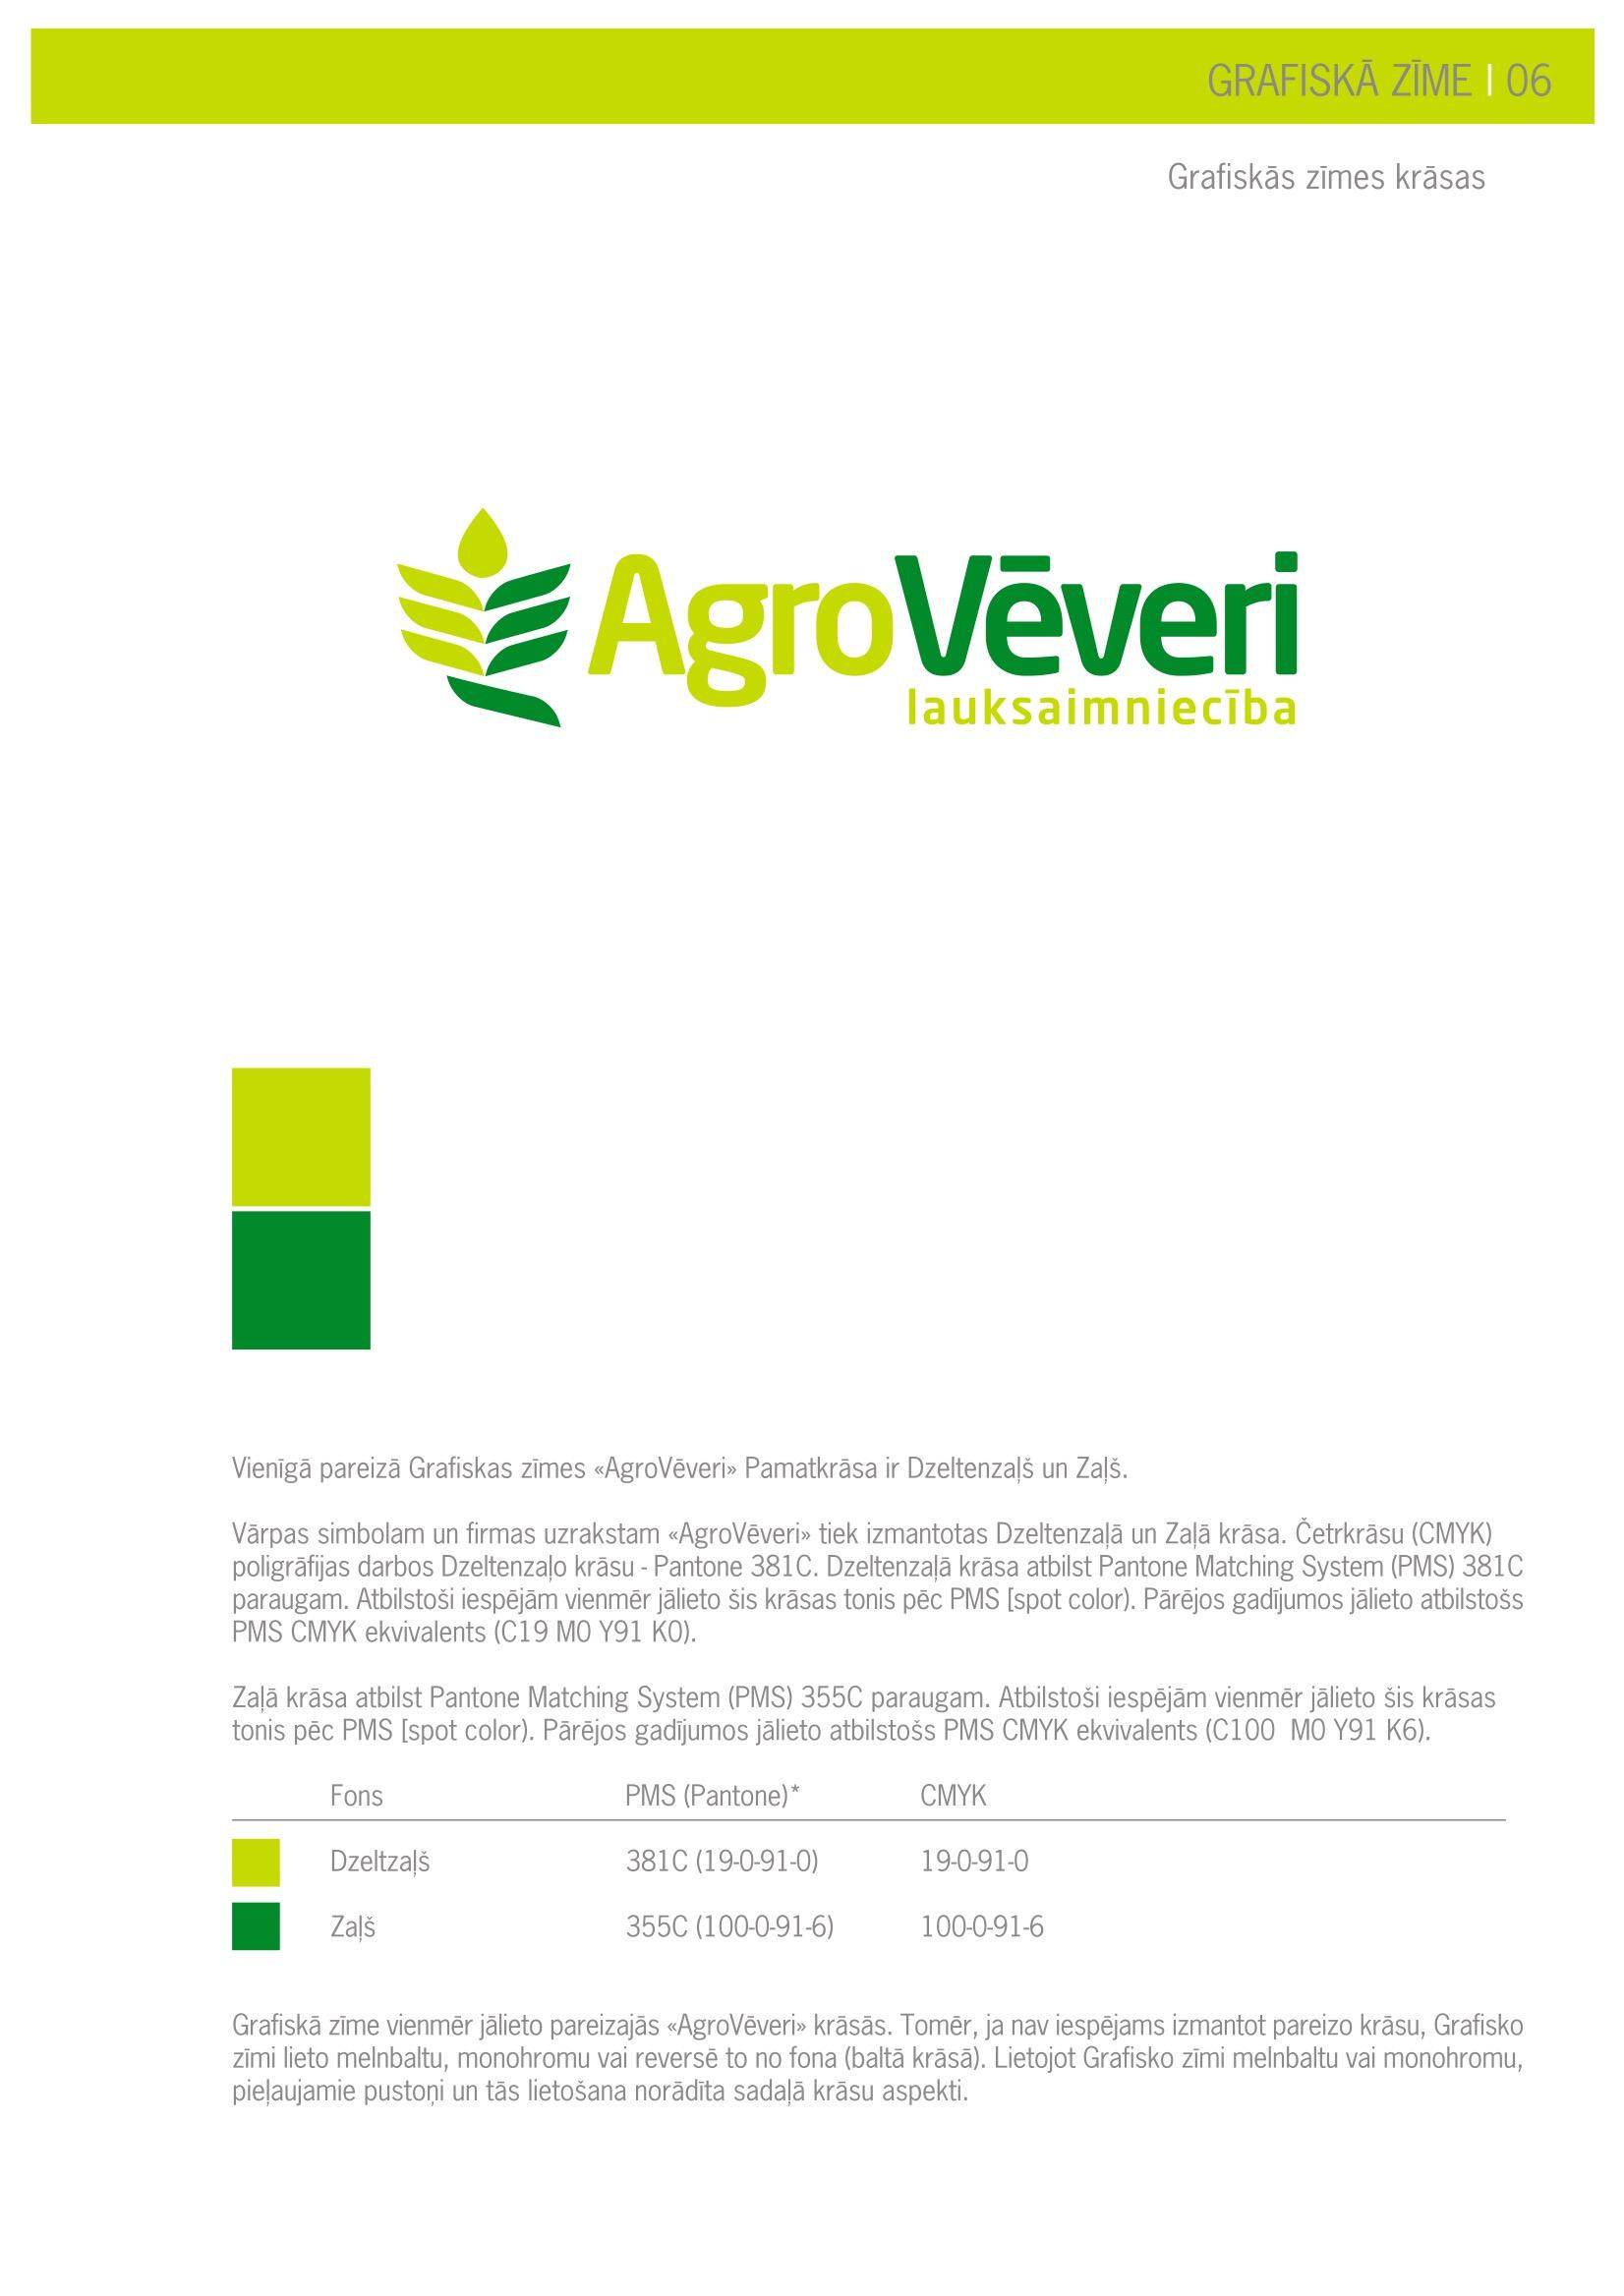 Agroveveri_Stils 6